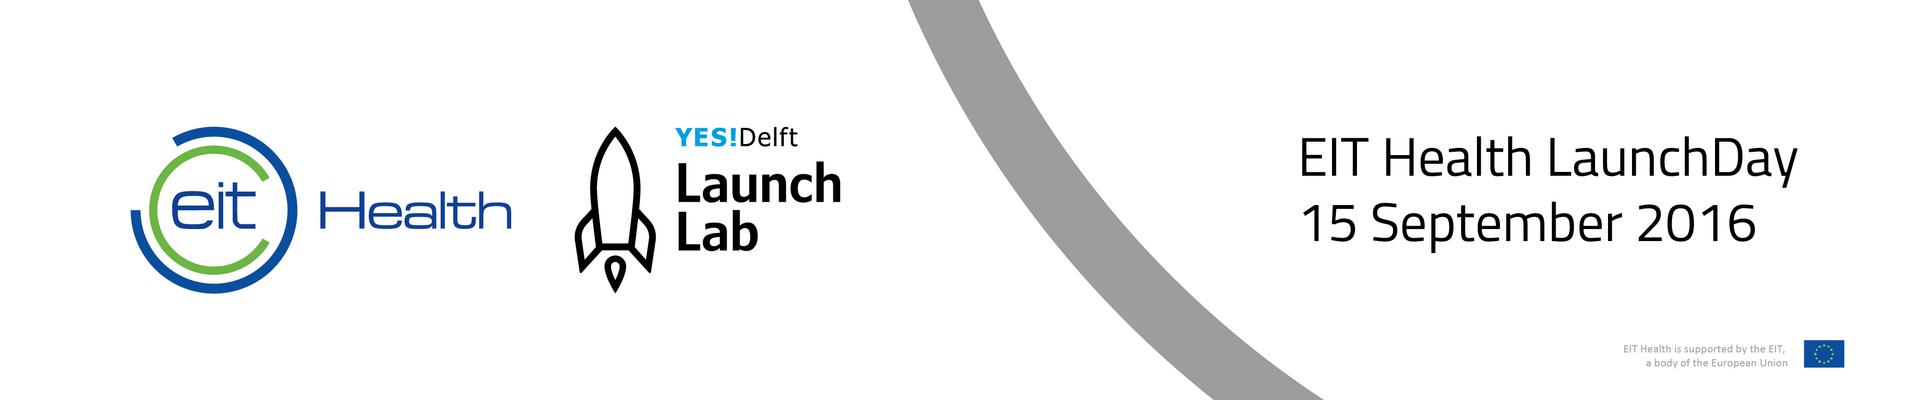 LaunchDay Eit Health